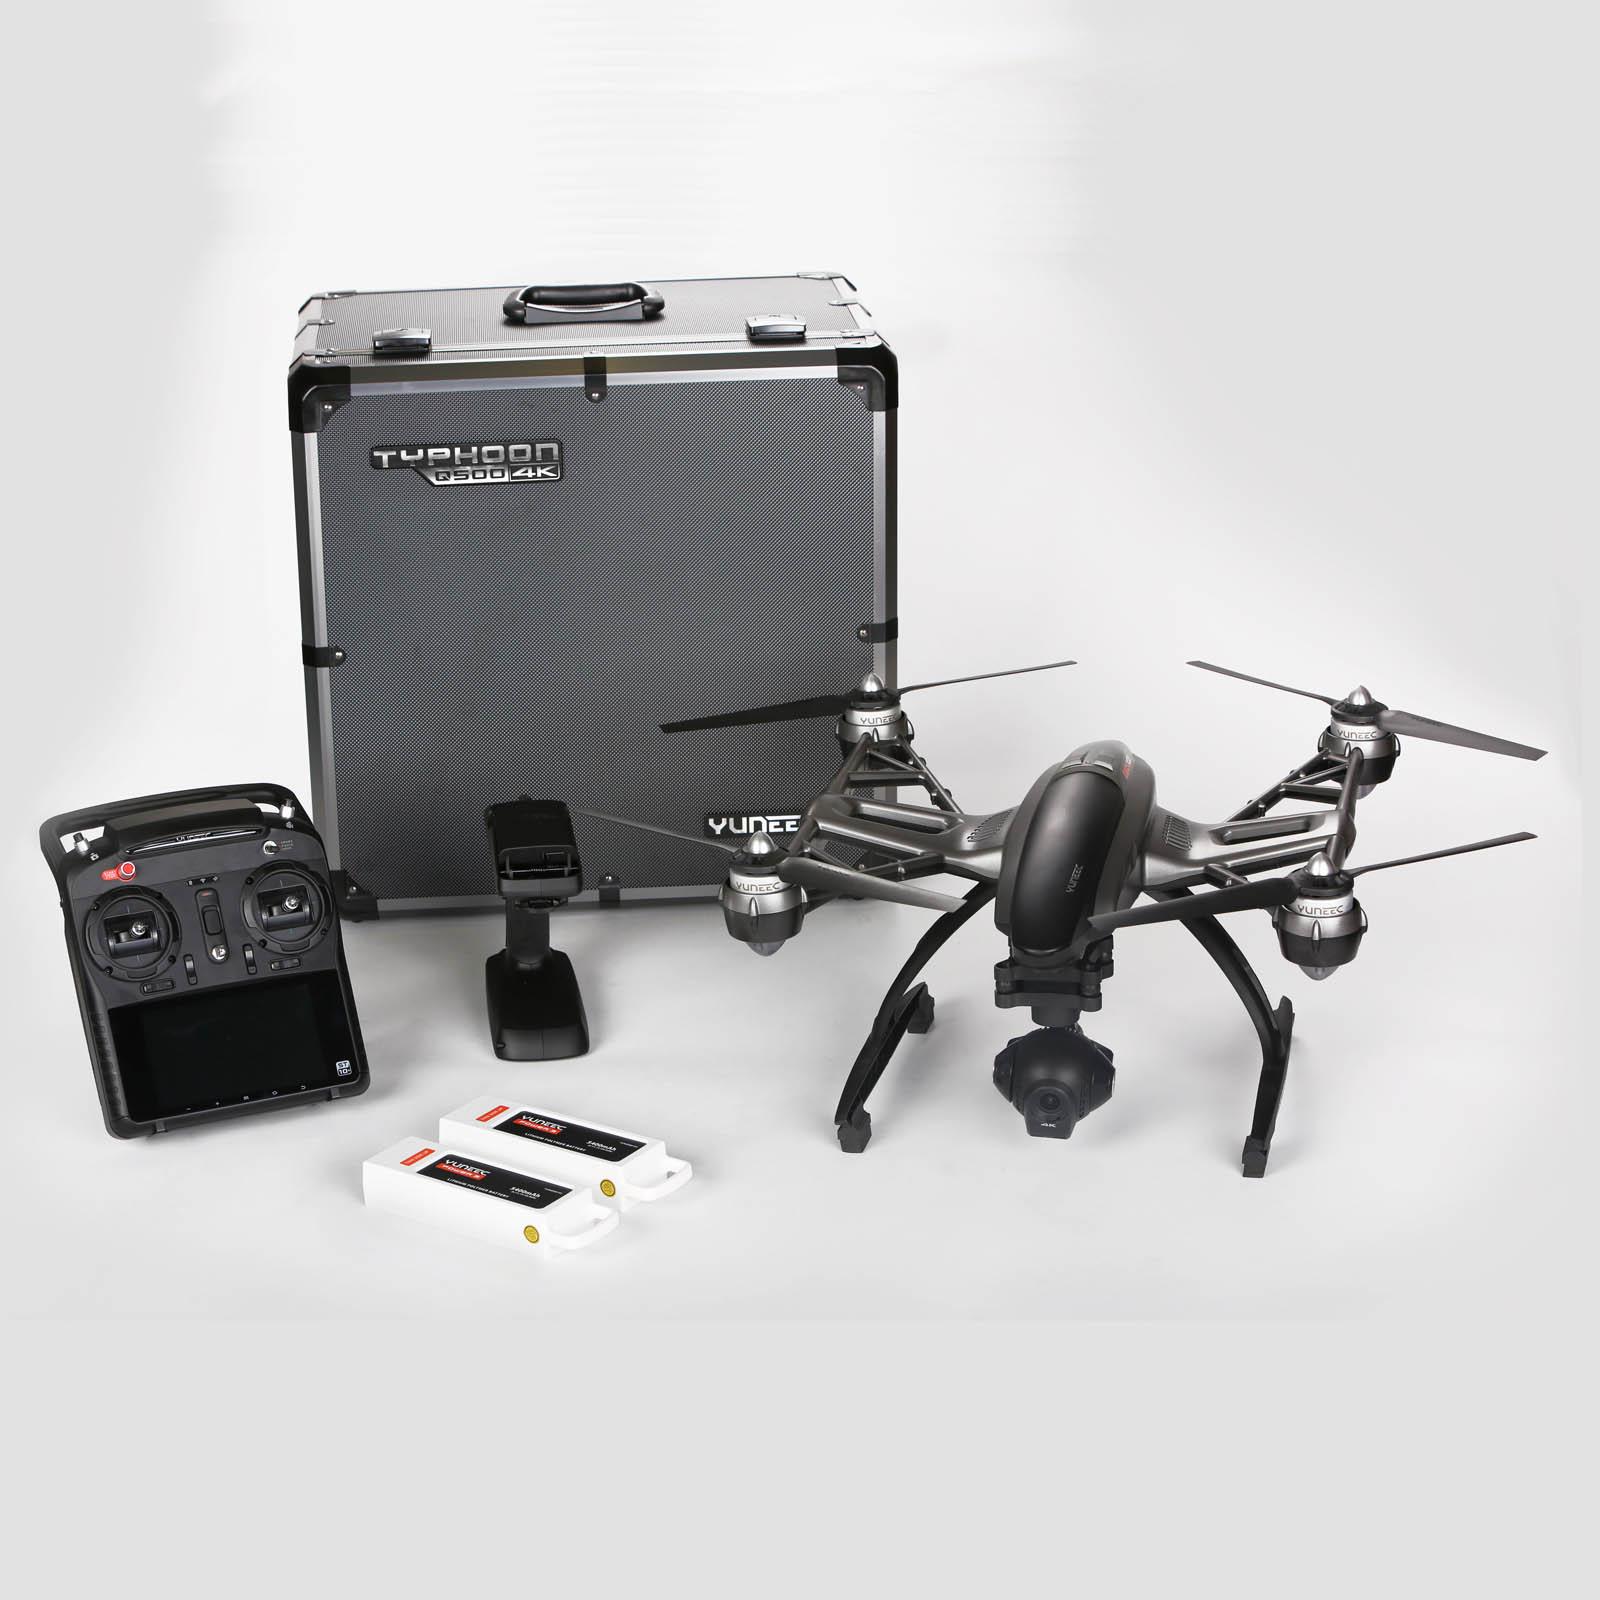 Iberdron Q500 4k contenido caja